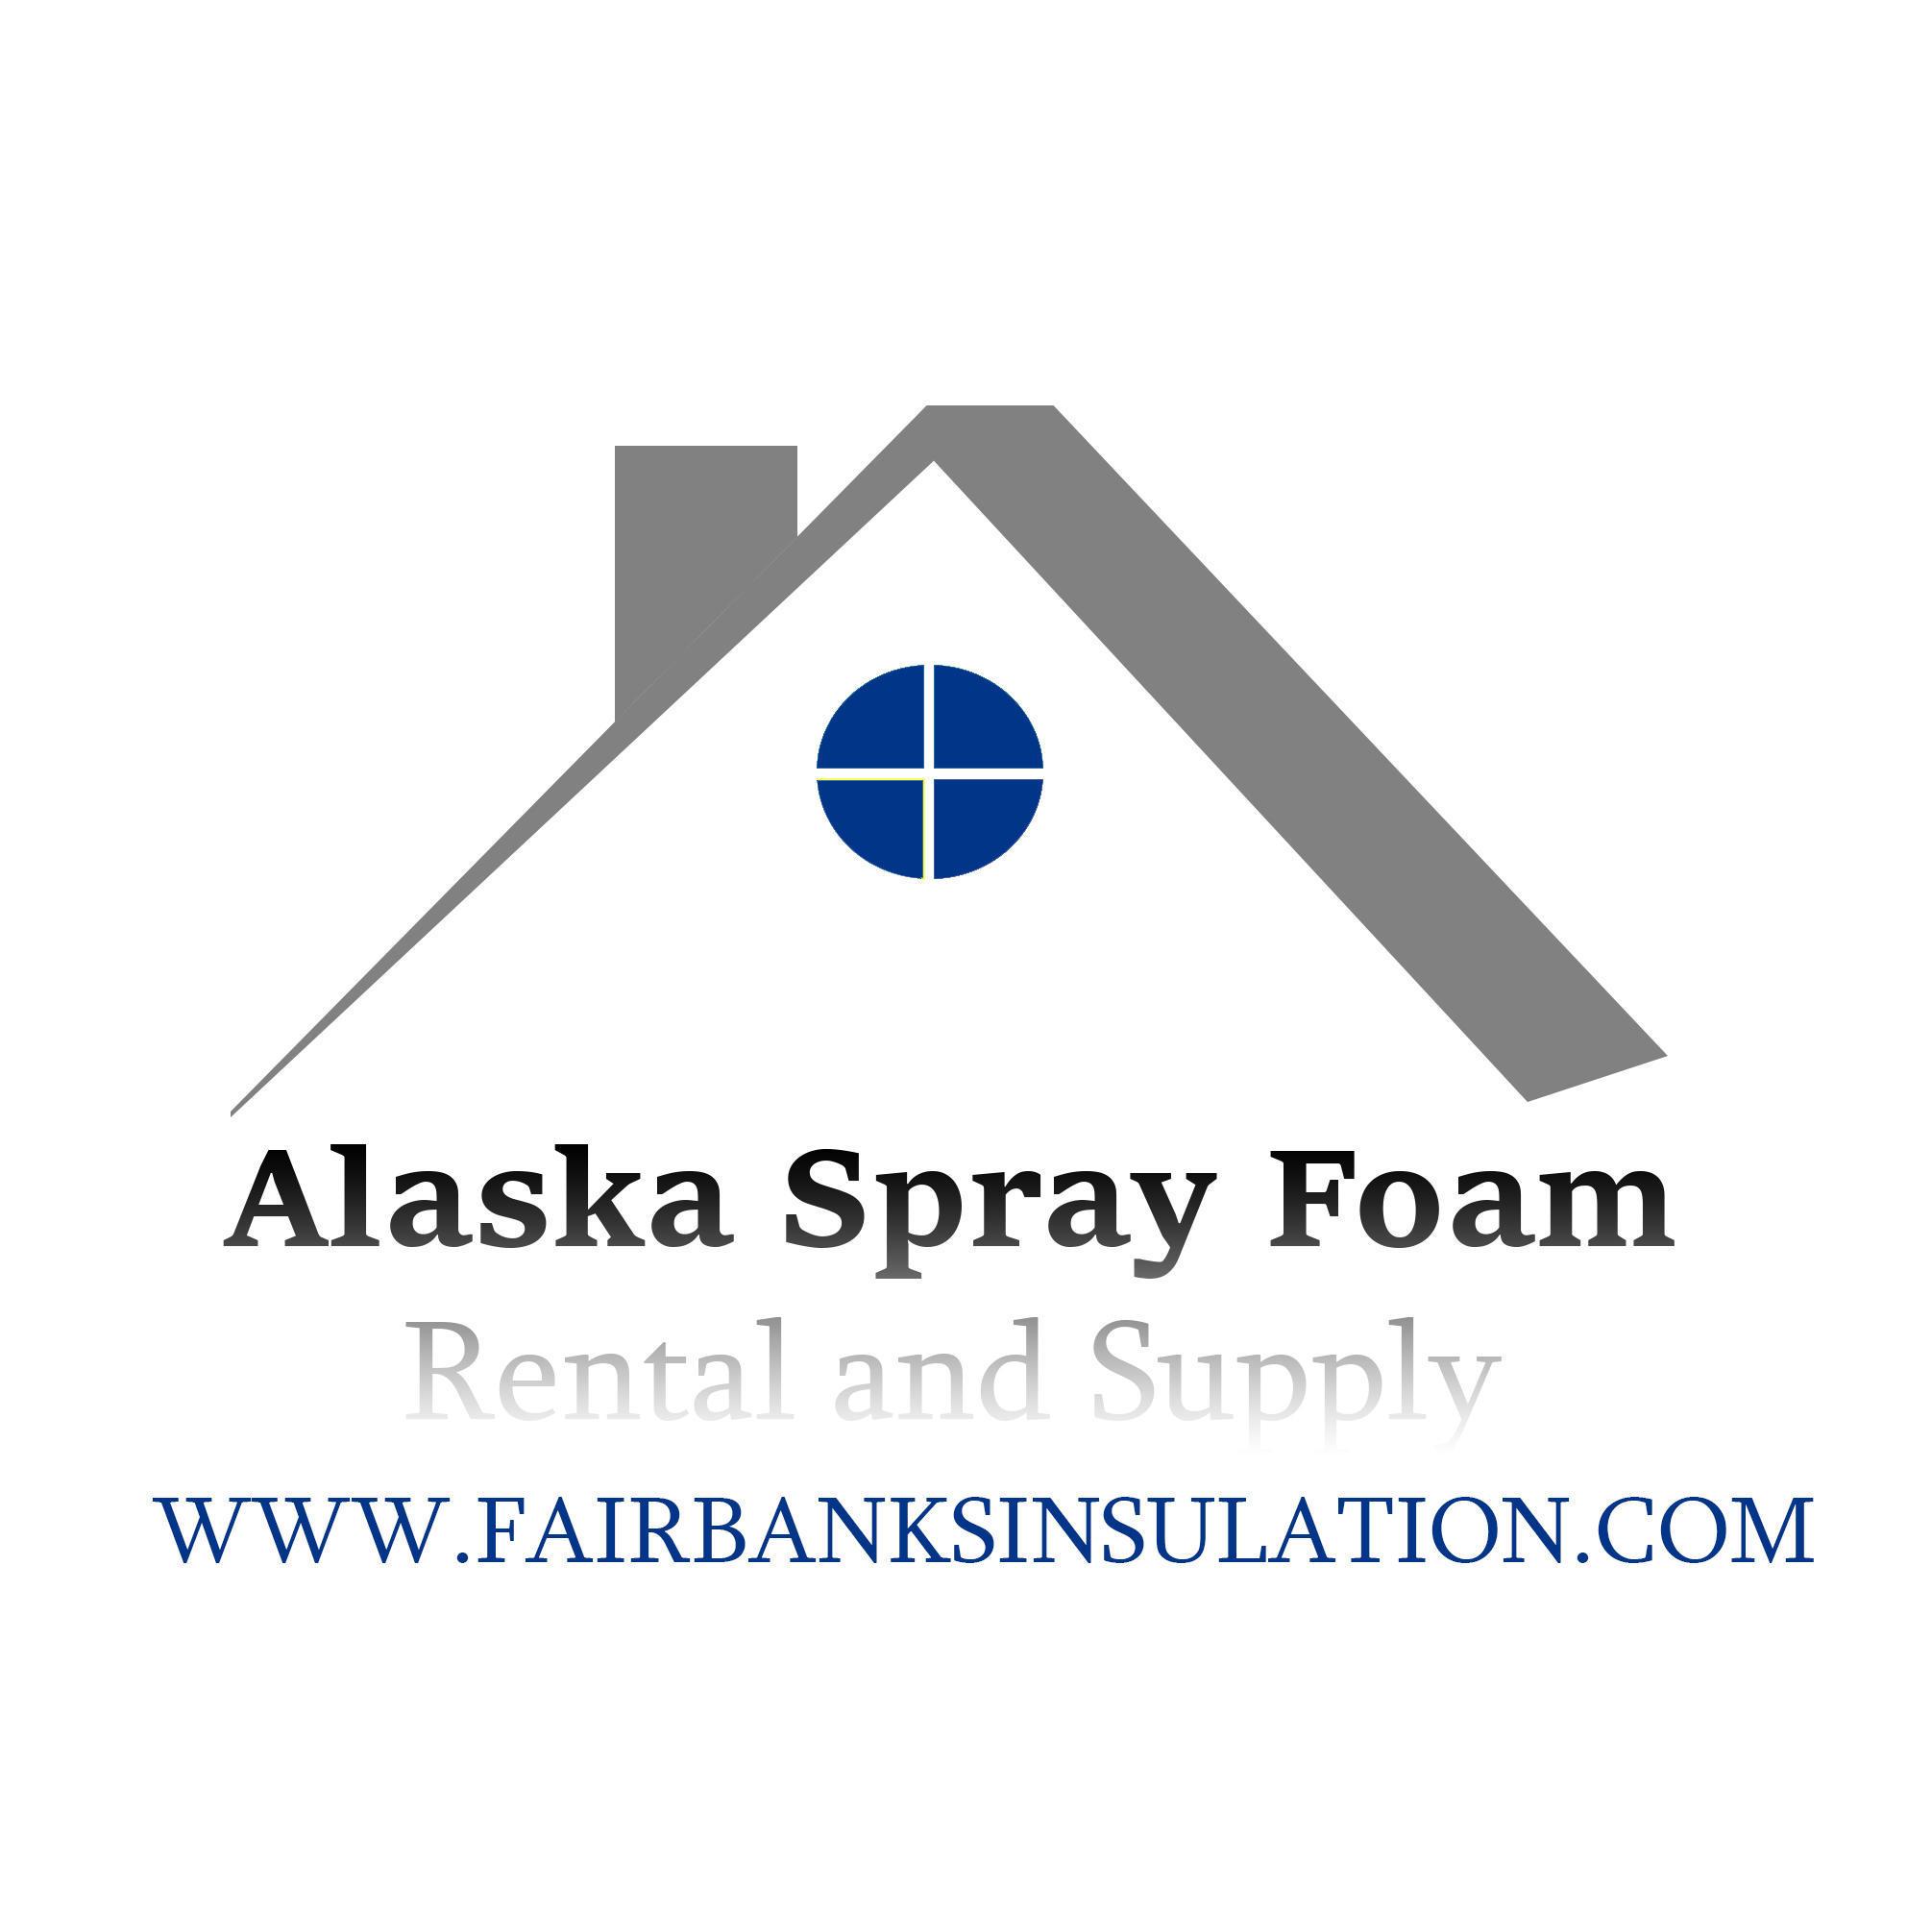 Alaska Spray Foam Rental and Supply image 5